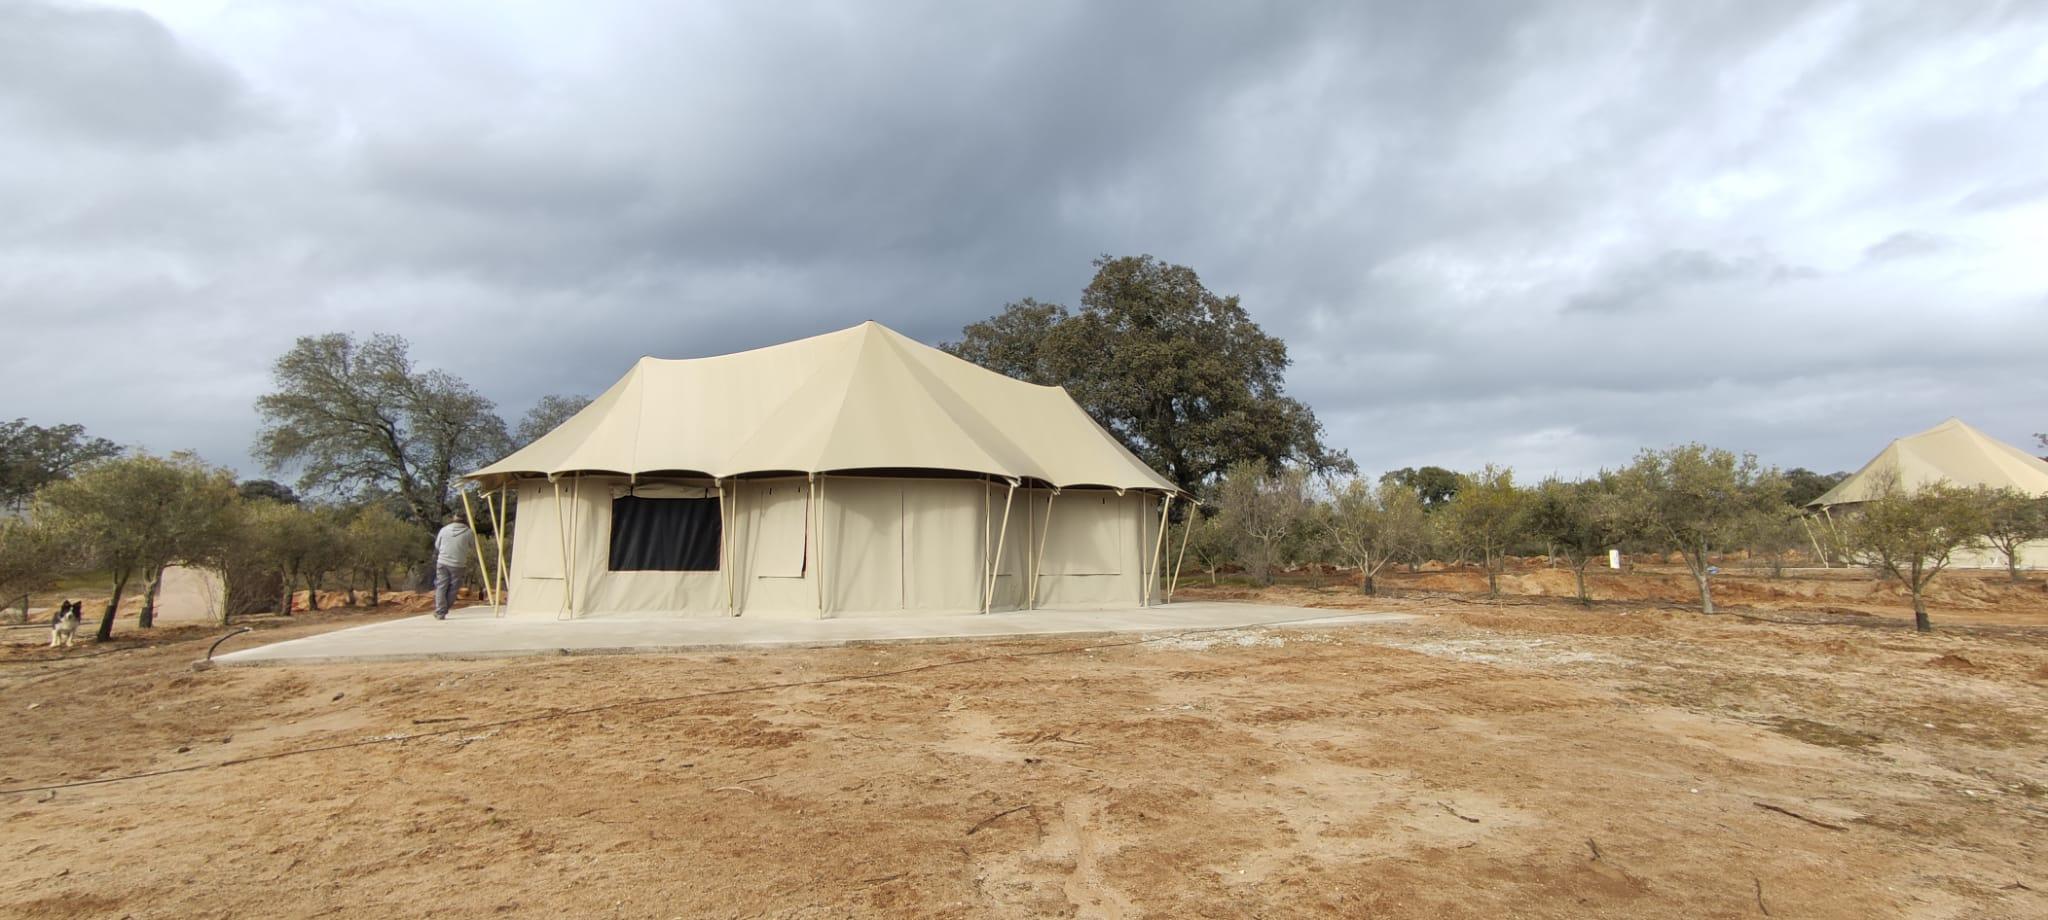 Luxury Tents in Spain